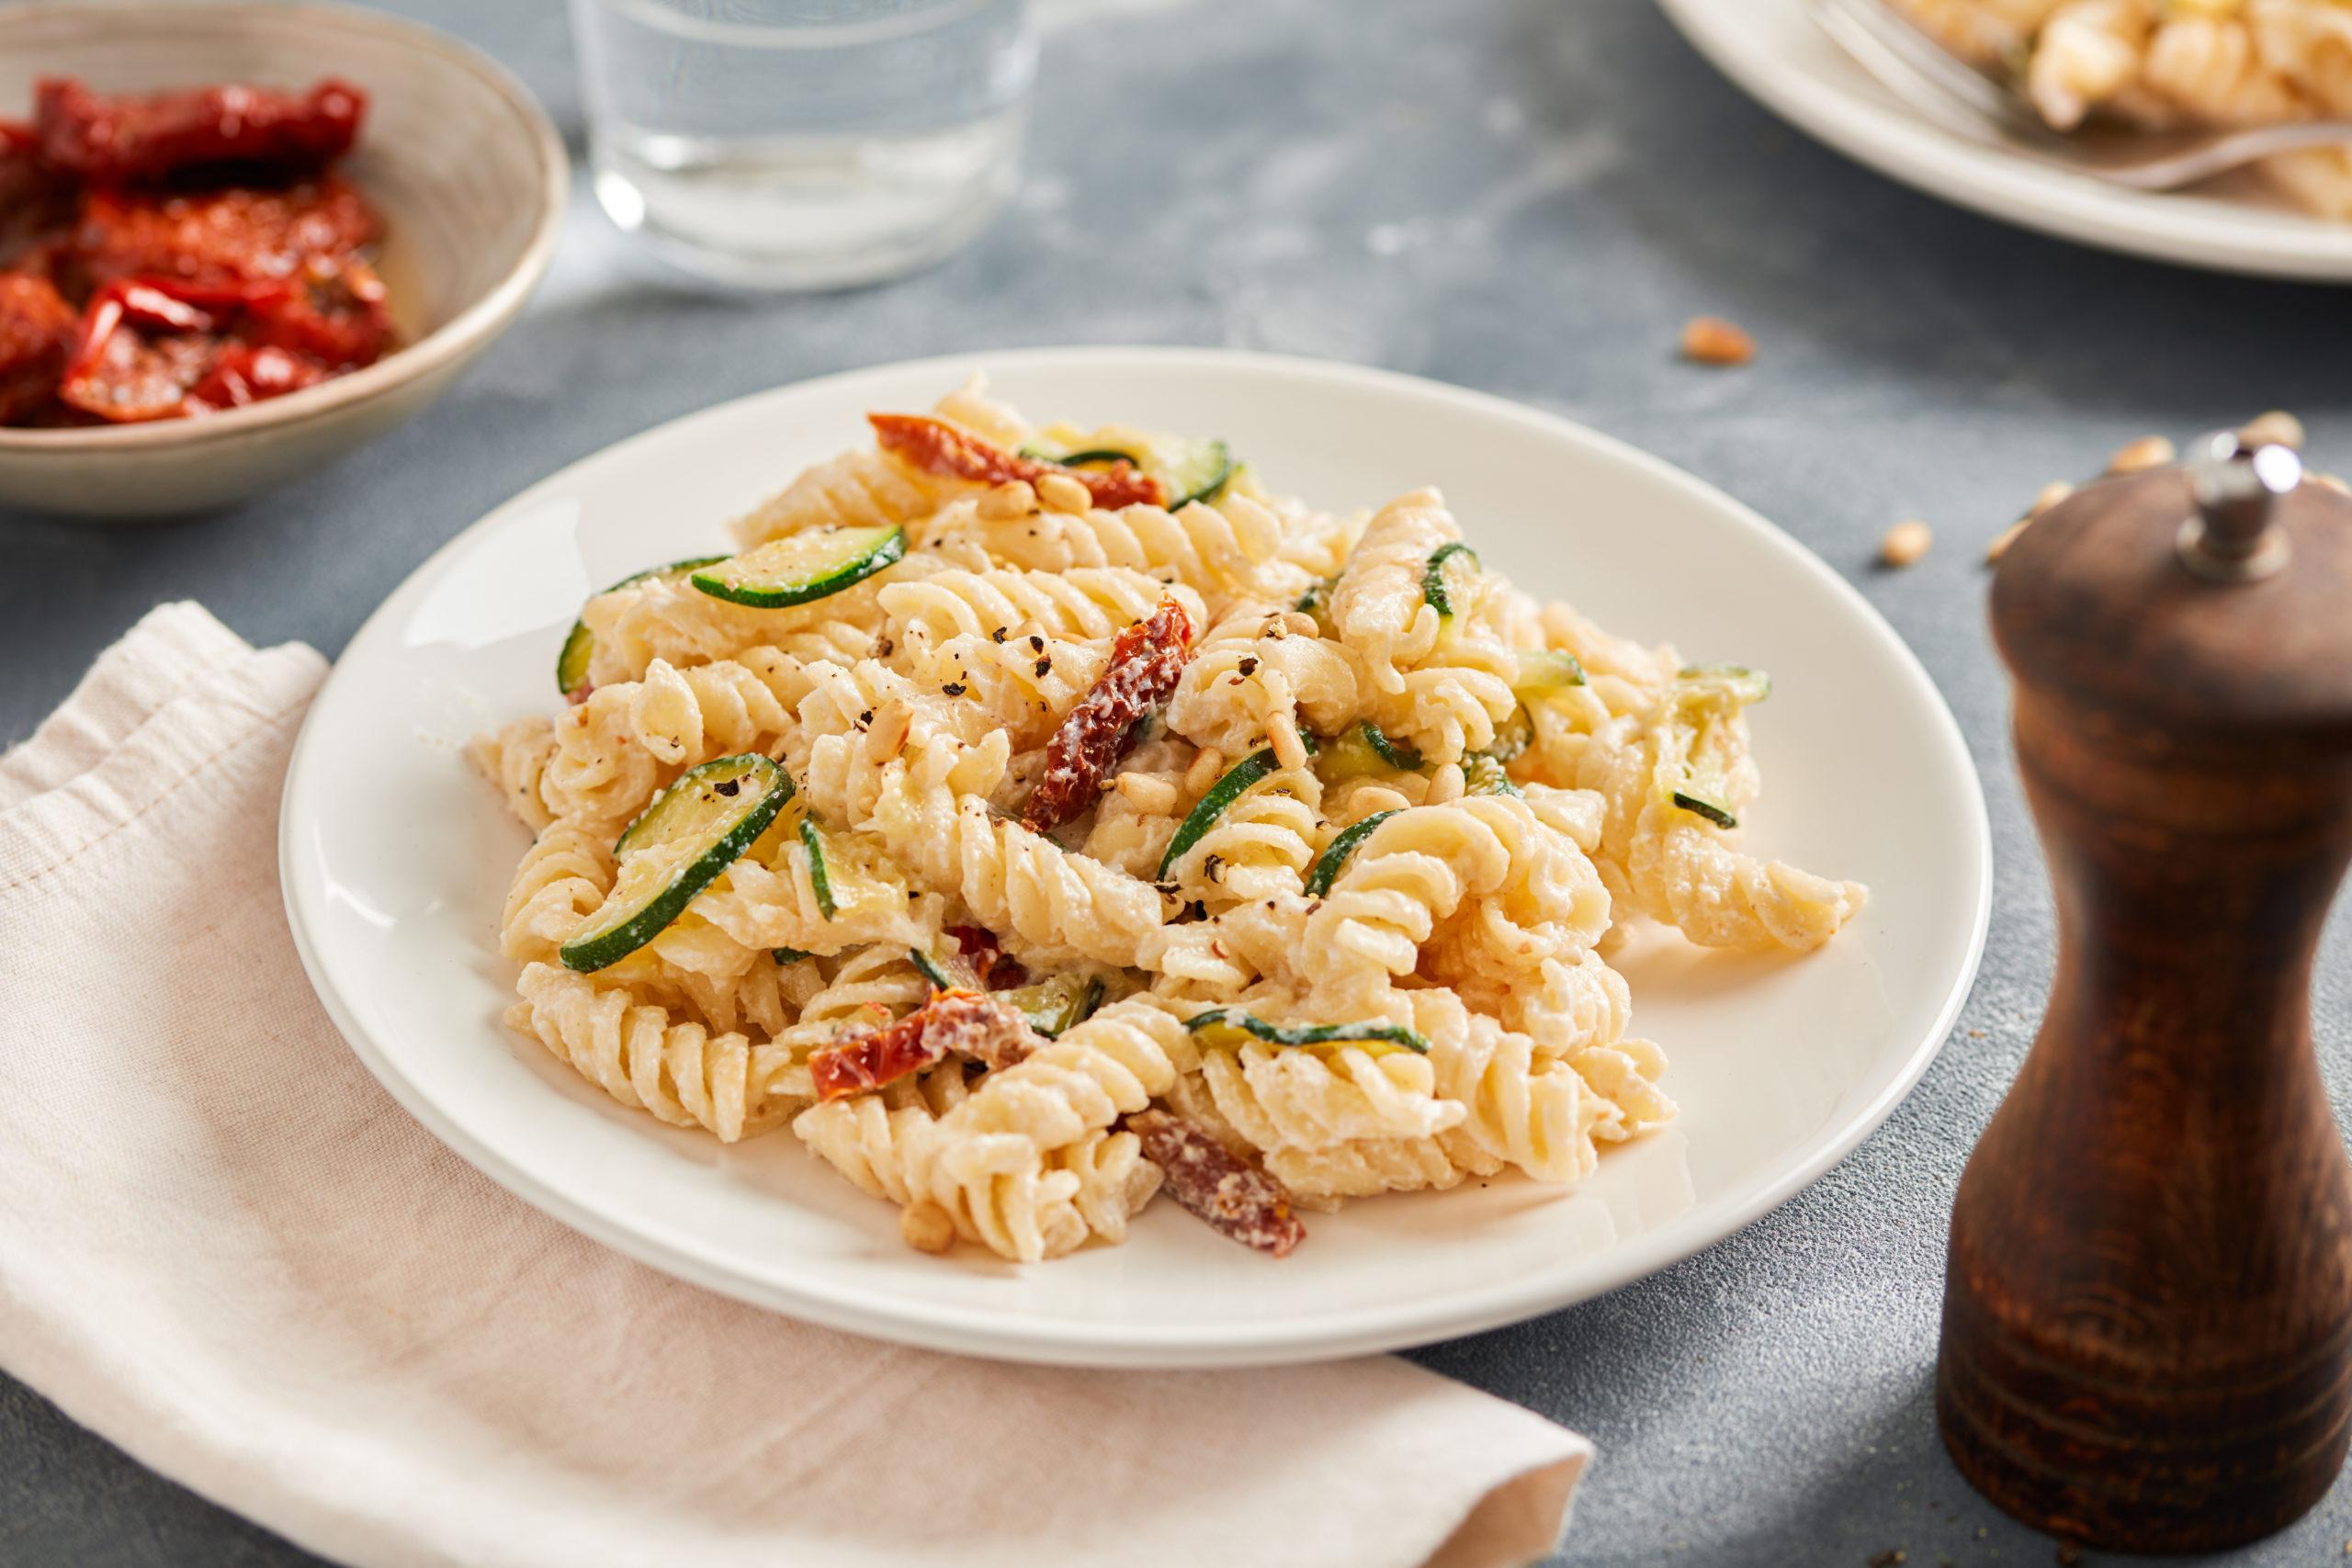 Pasta with Zucchini, Sun-Dried Tomatoes, Ricotta & Pine Nuts